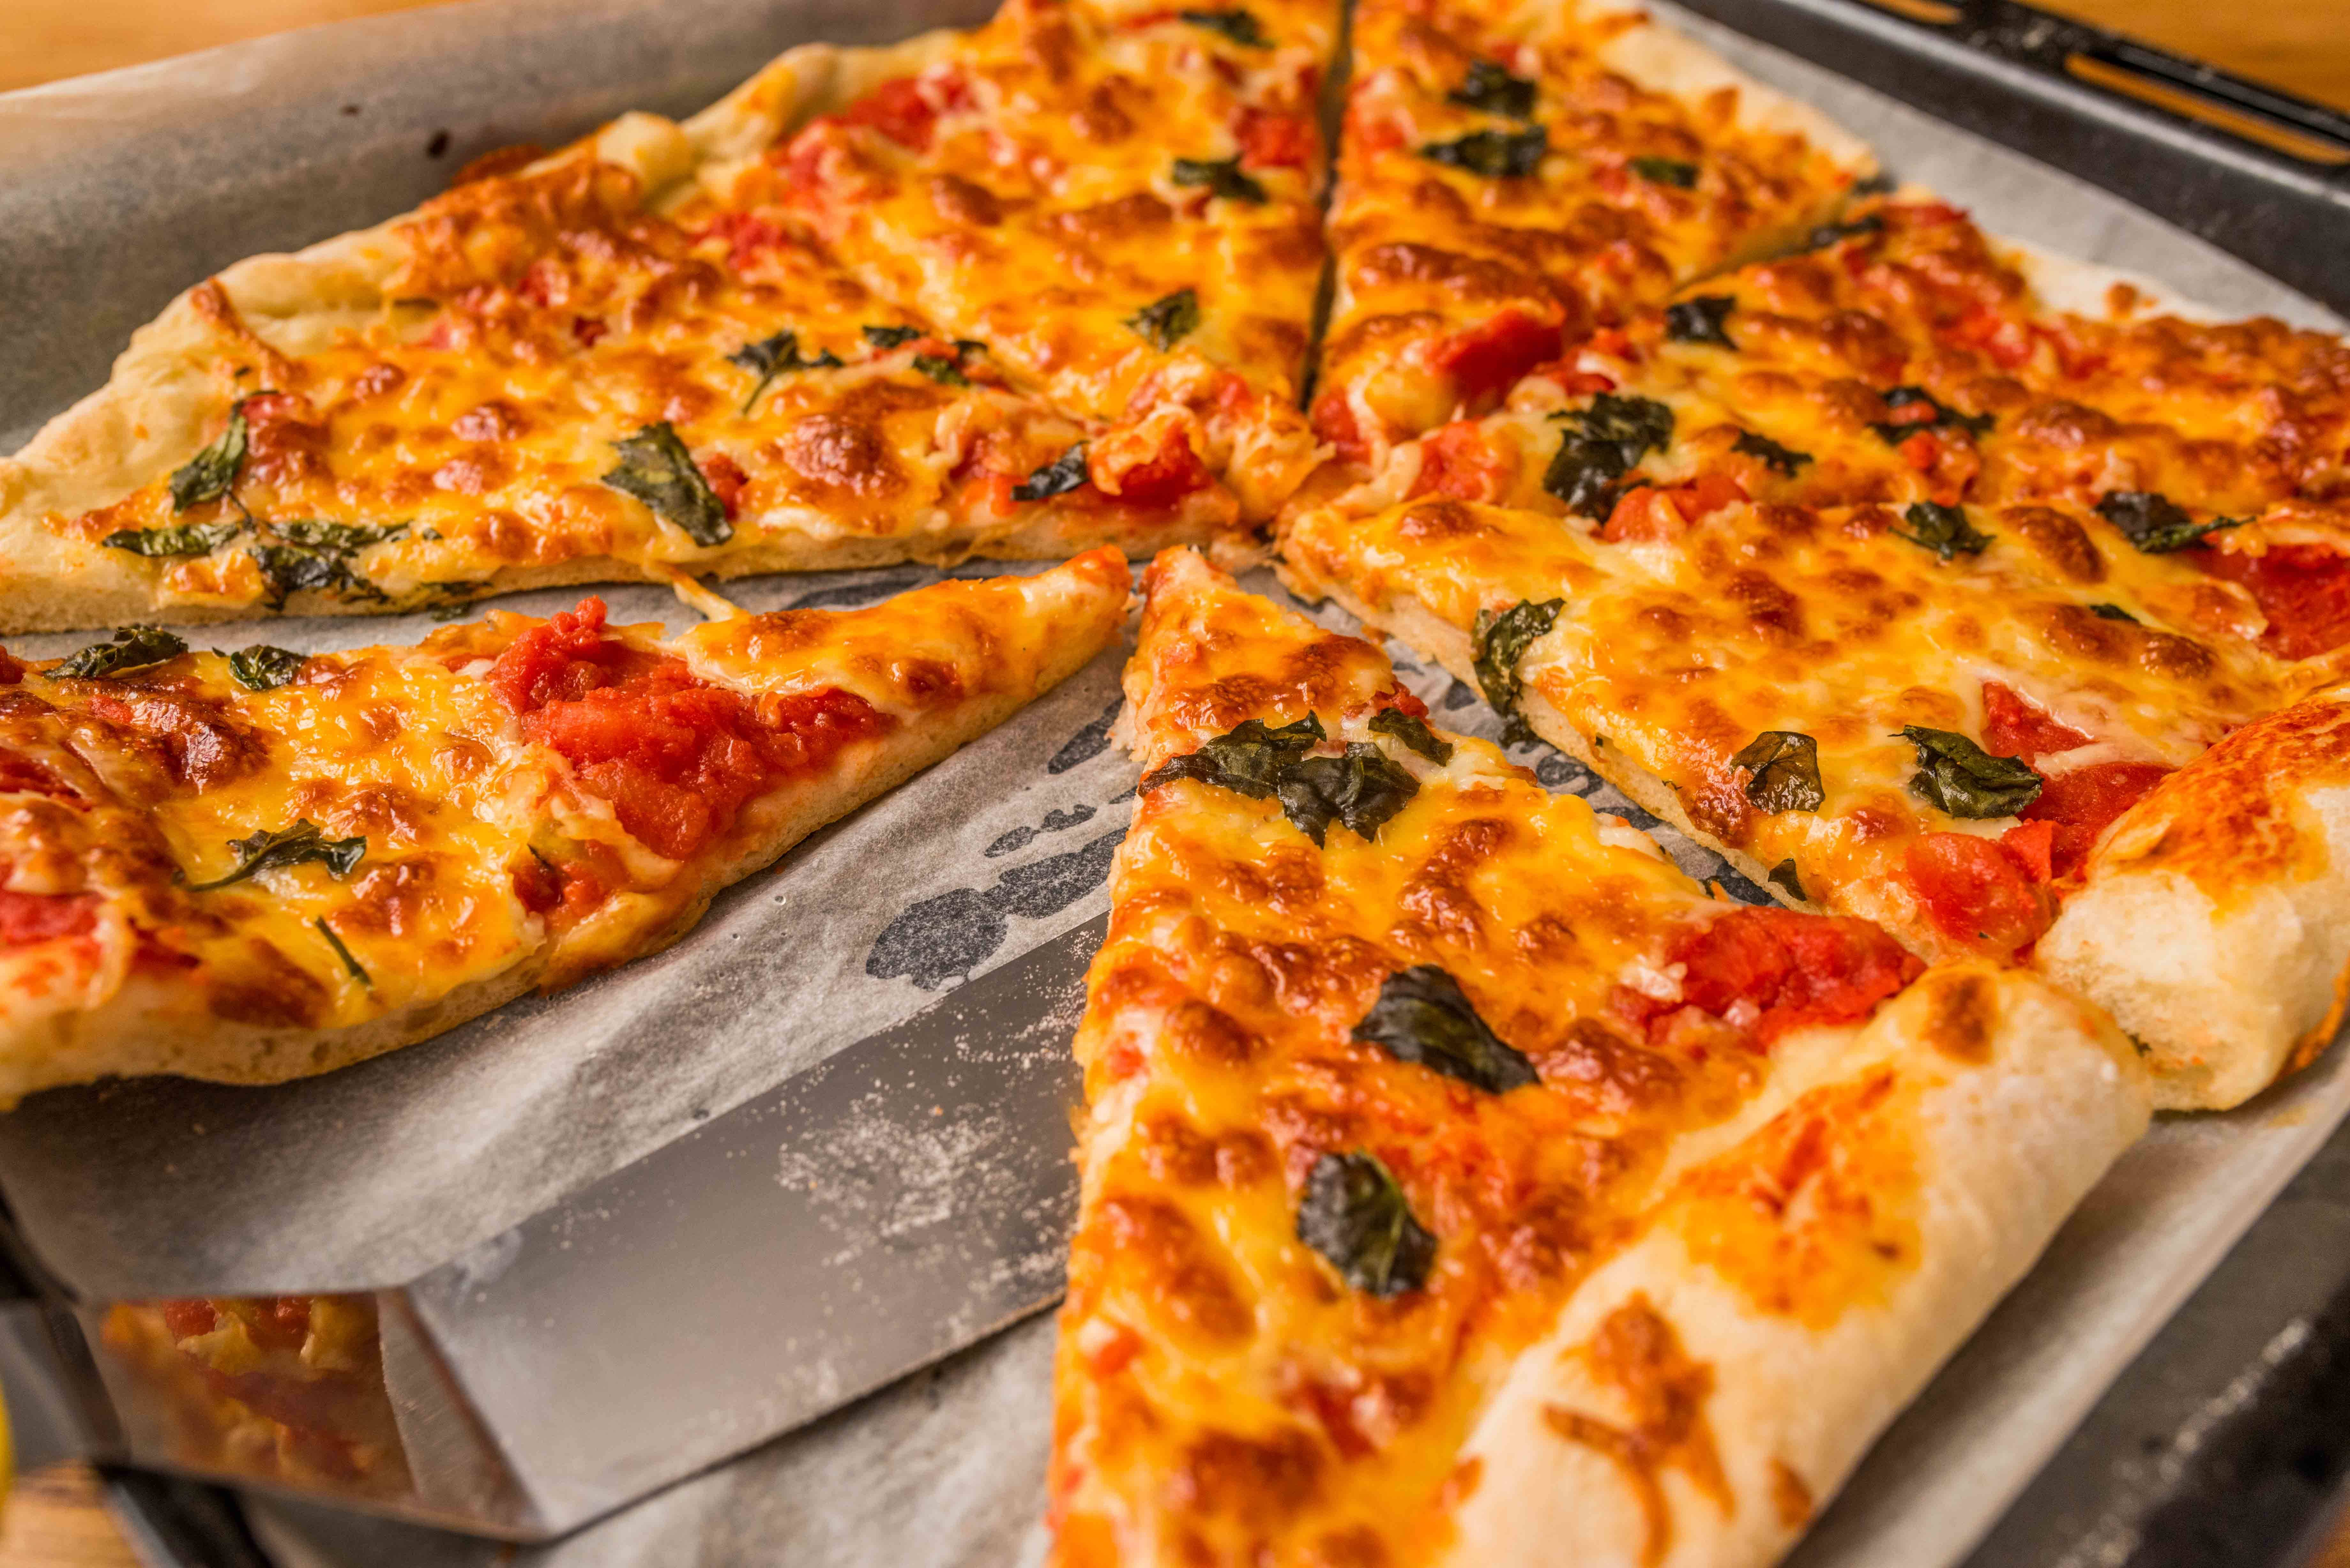 h zi margherita pizza recept apr s f hu receptek k pekkel. Black Bedroom Furniture Sets. Home Design Ideas